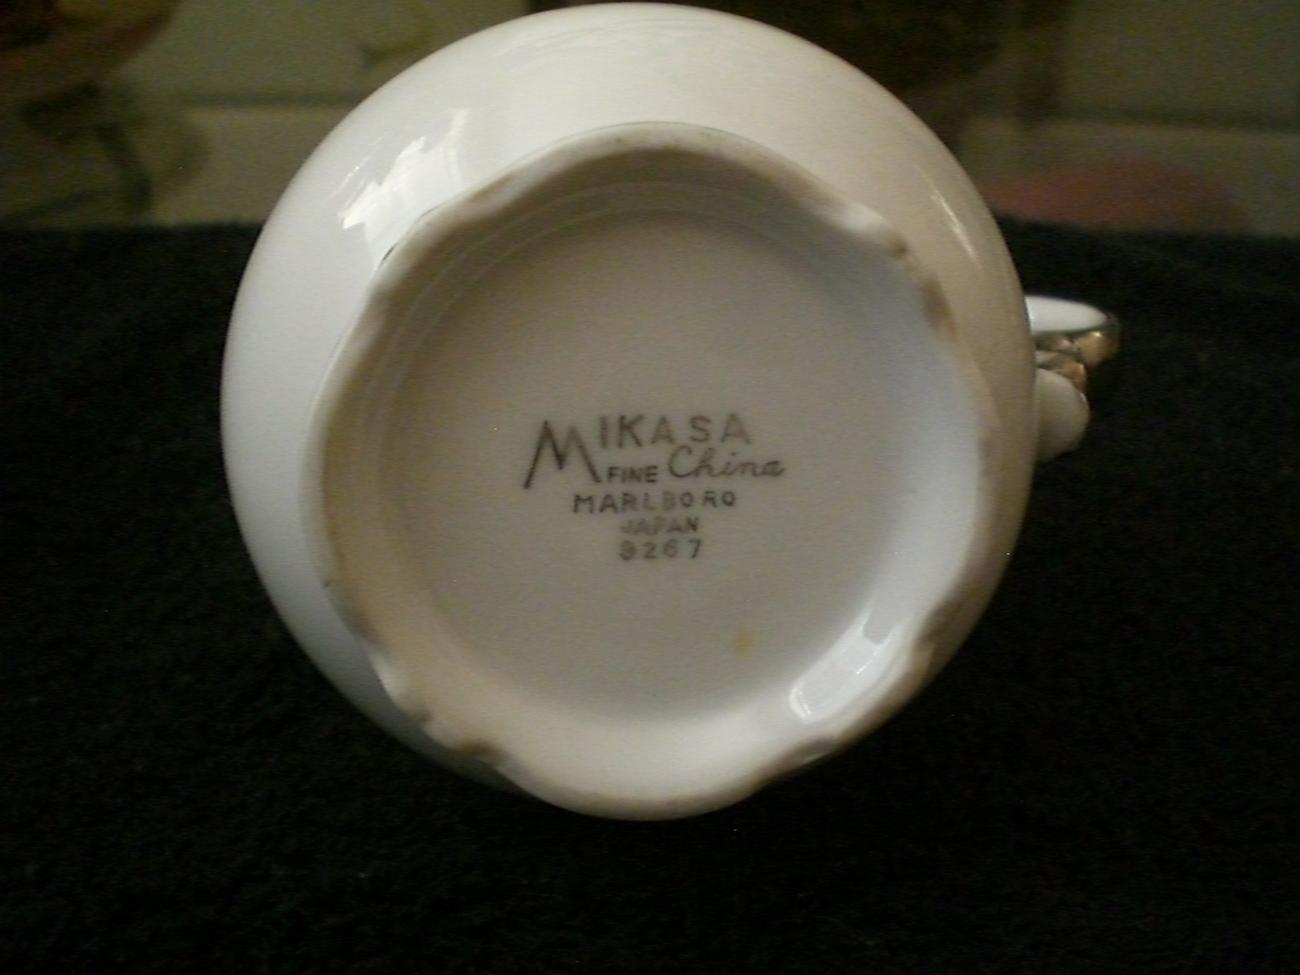 Mikasa Fine China Creamer Marlboro 9267 Japan